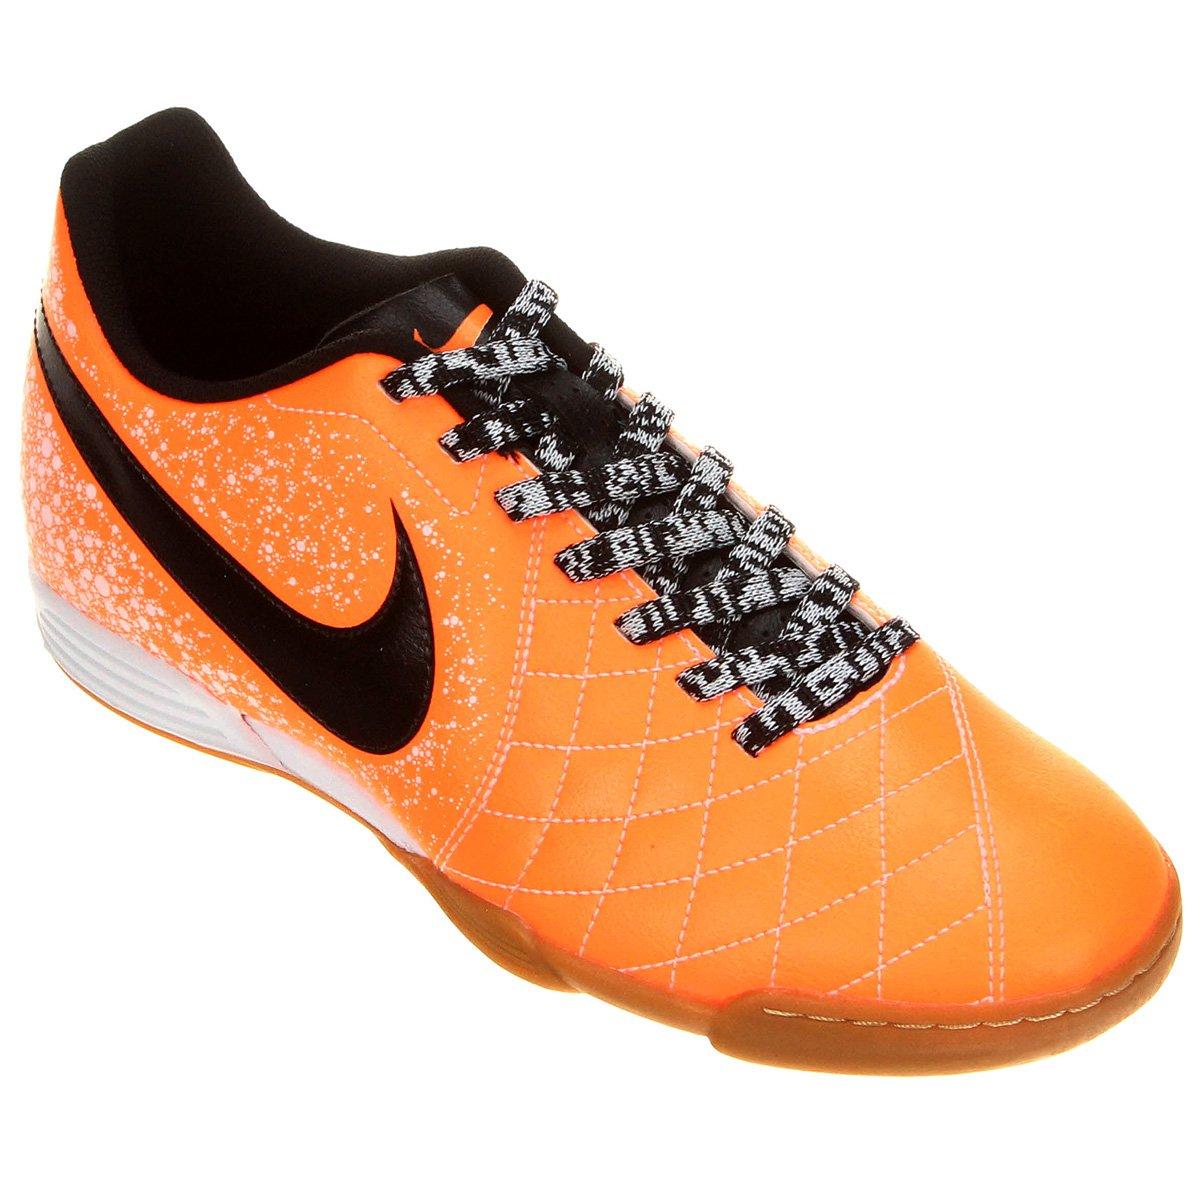 Chuteira Nike Flare 2 IC - Compre Agora  d4c3c4379ccc7